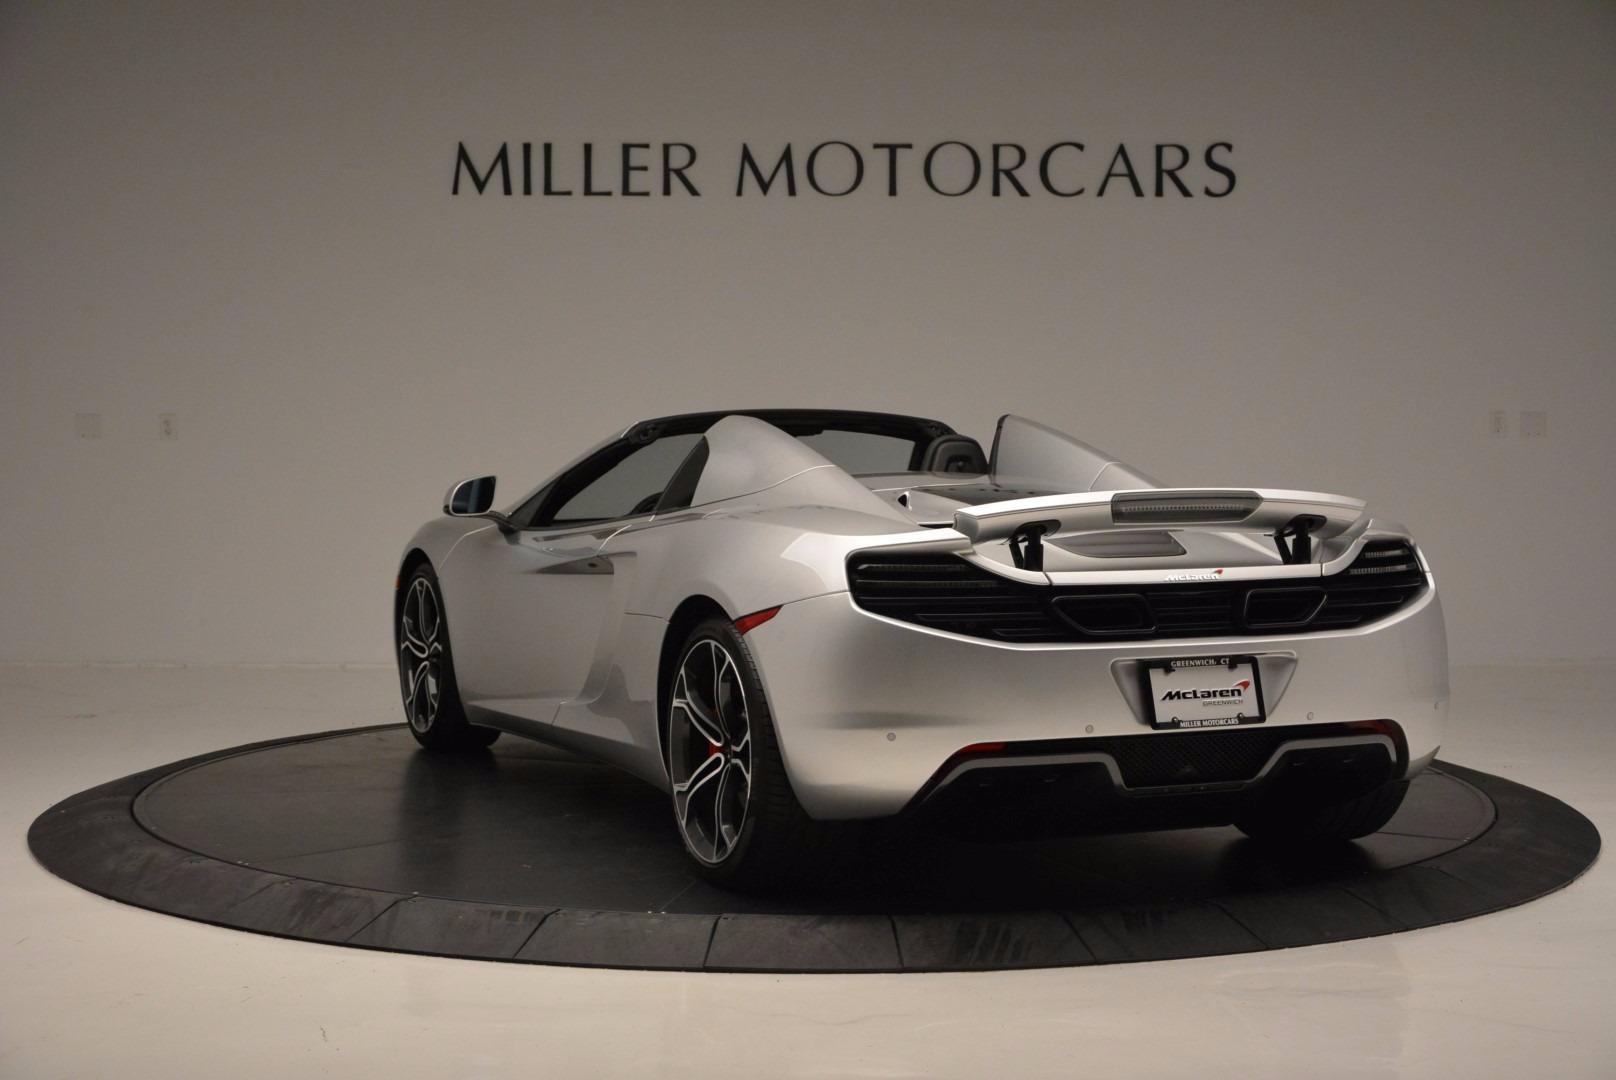 Used 2014 McLaren MP4-12C Spider  For Sale In Greenwich, CT. Alfa Romeo of Greenwich, 3089 627_p5